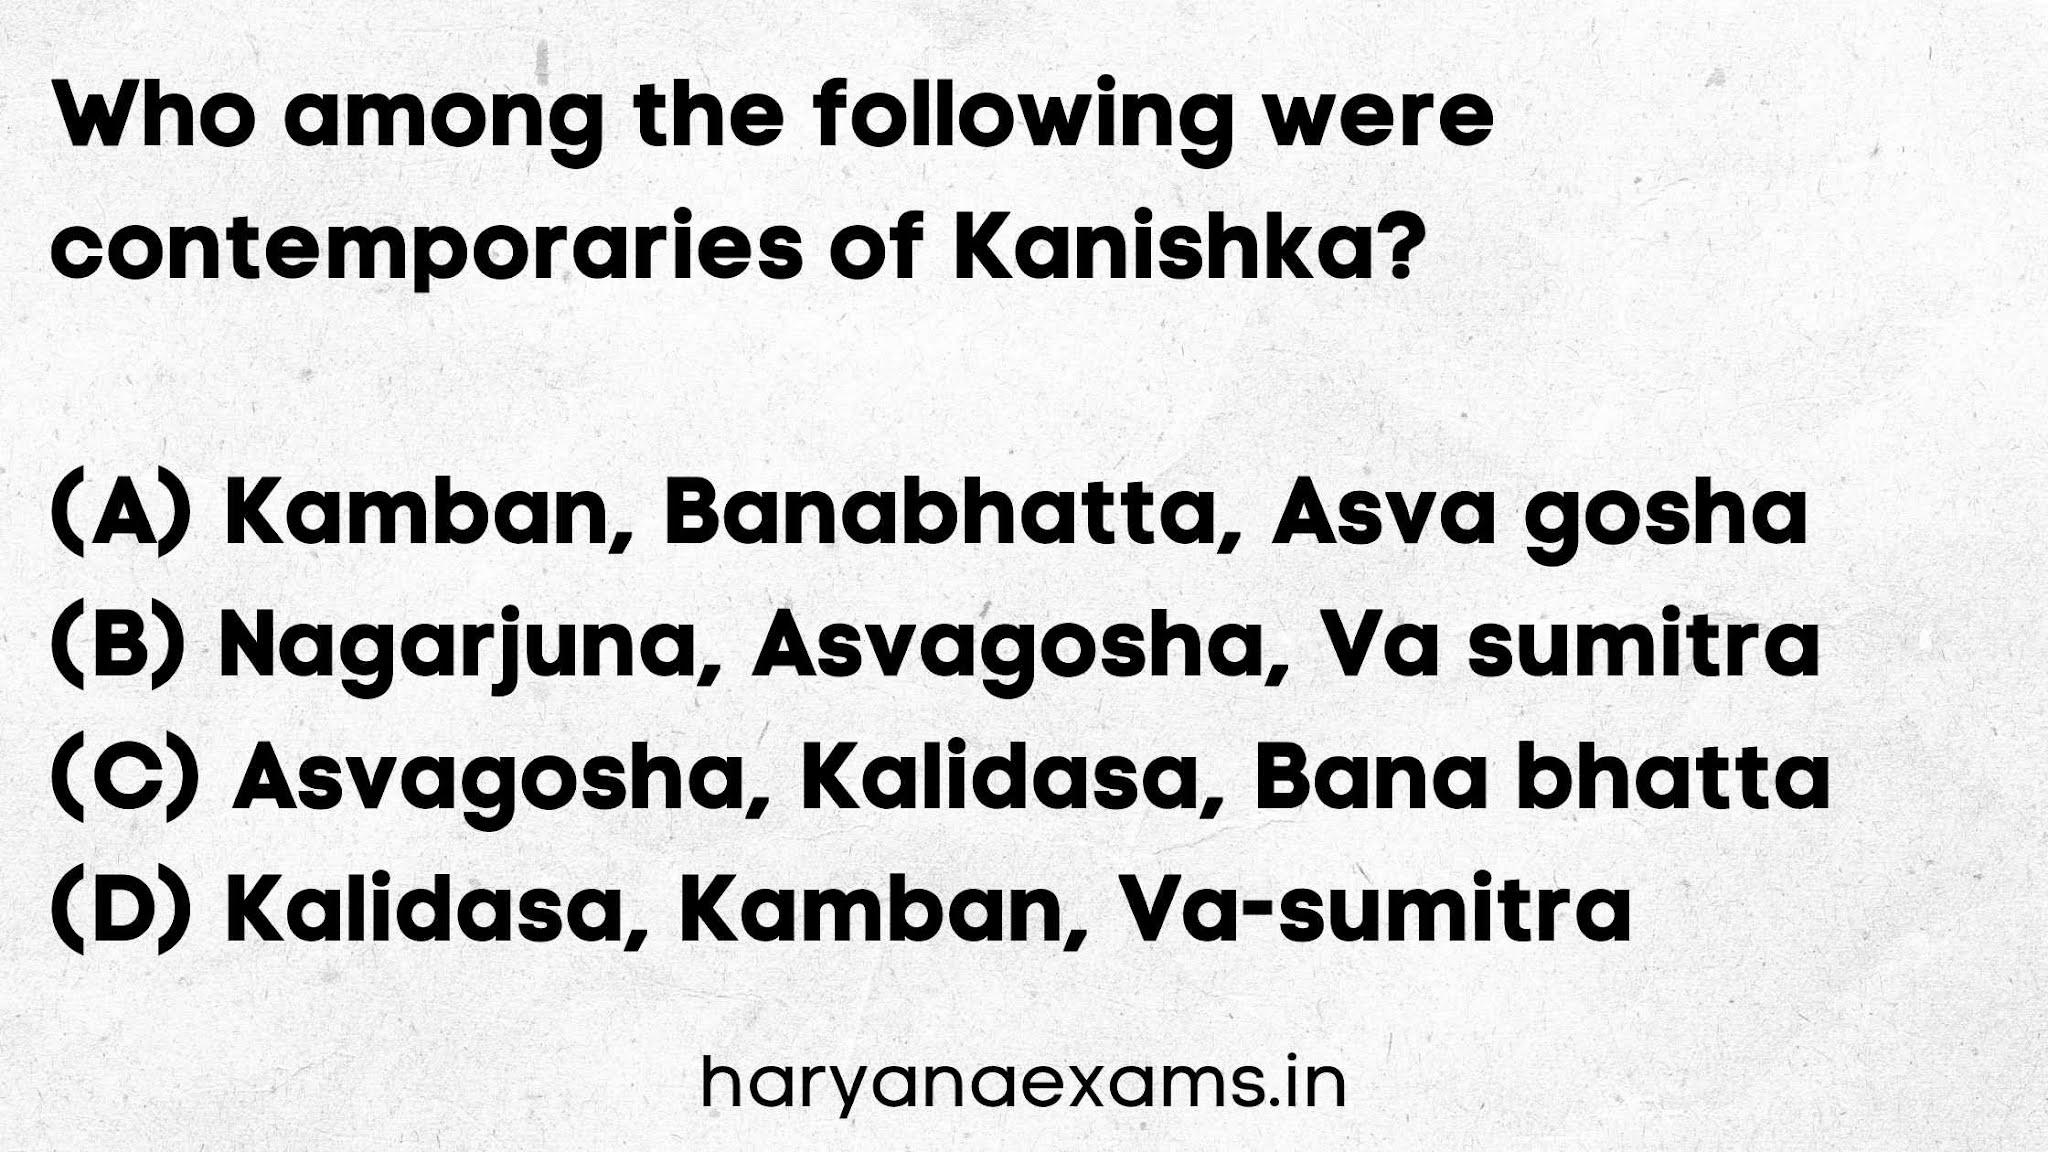 Who among the following were contemporaries of Kanishka?   (A) Kamban, Banabhatta, Asva gosha   (B) Nagarjuna, Asvagosha, Va sumitra   (C) Asvagosha, Kalidasa, Bana bhatta   (D) Kalidasa, Kamban, Va-sumitra